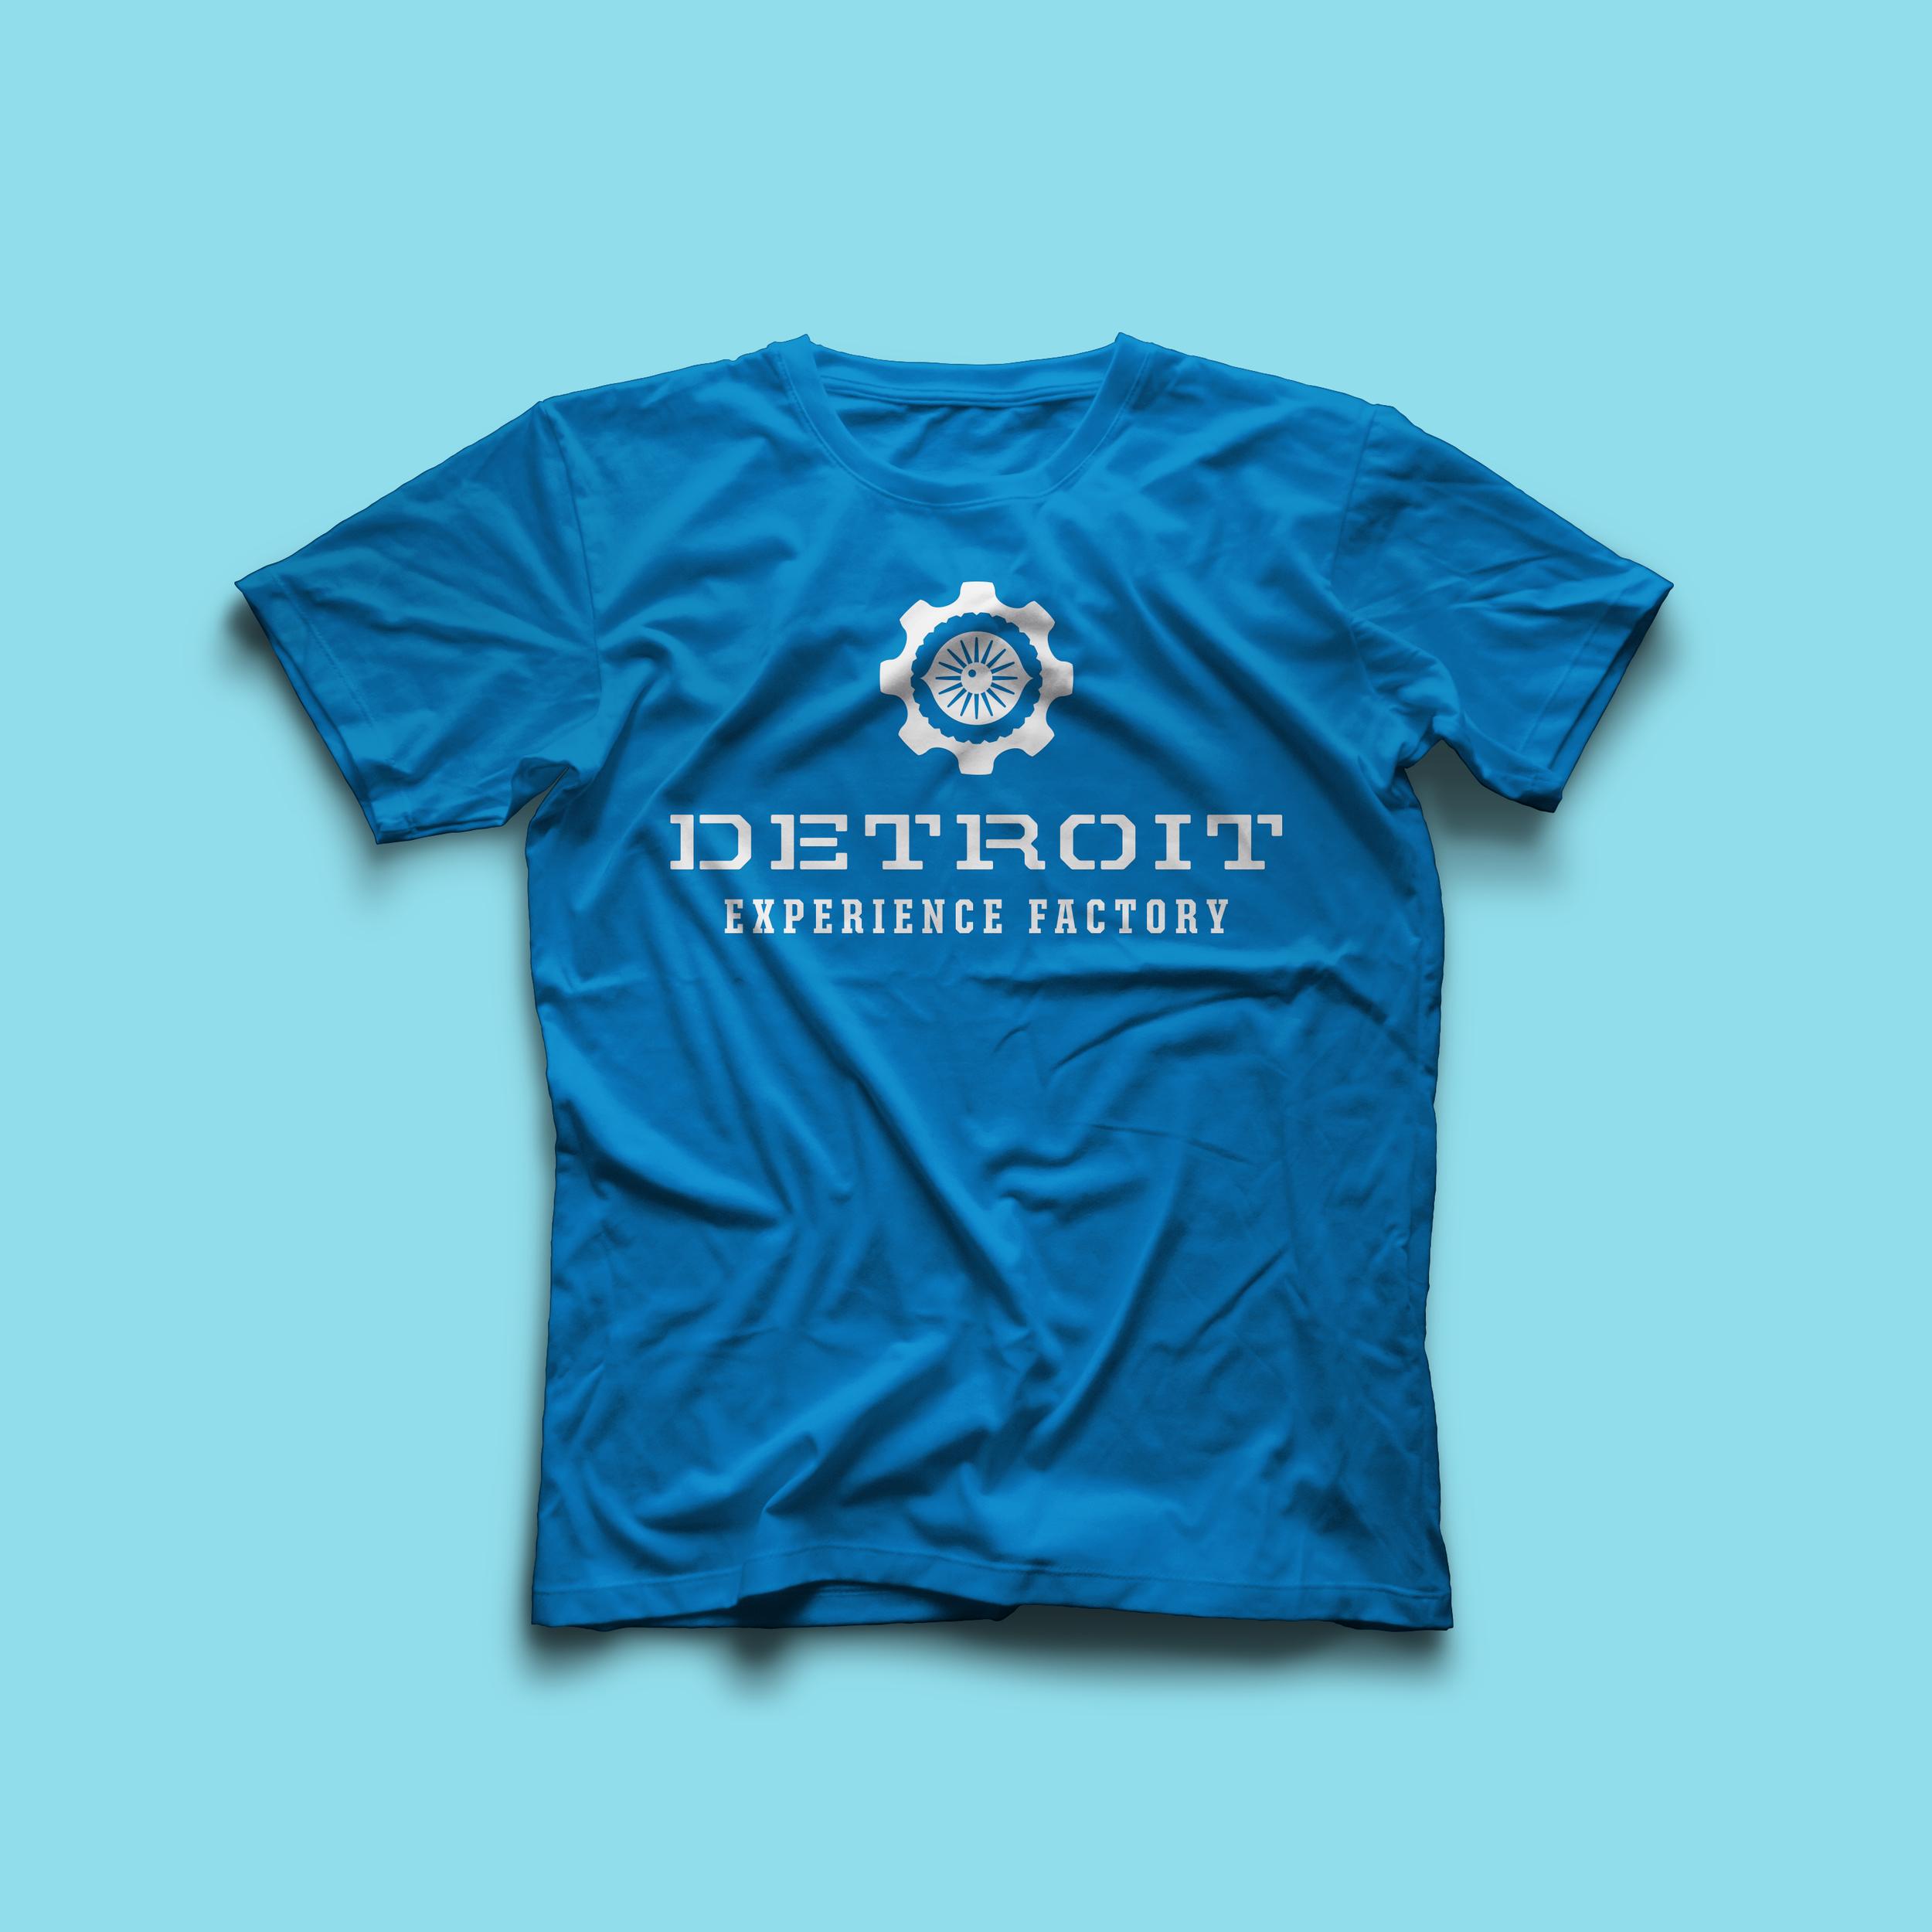 01-T-Shirt-Mock-up-Front.jpg